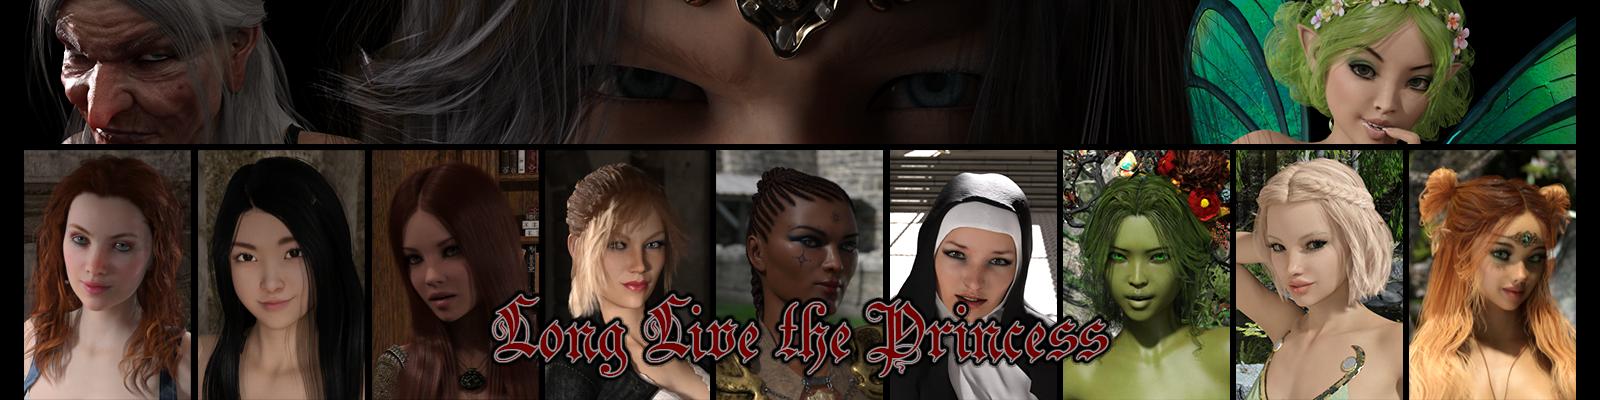 Long Live the Princess – Version 0.29 - family incest porn game 1